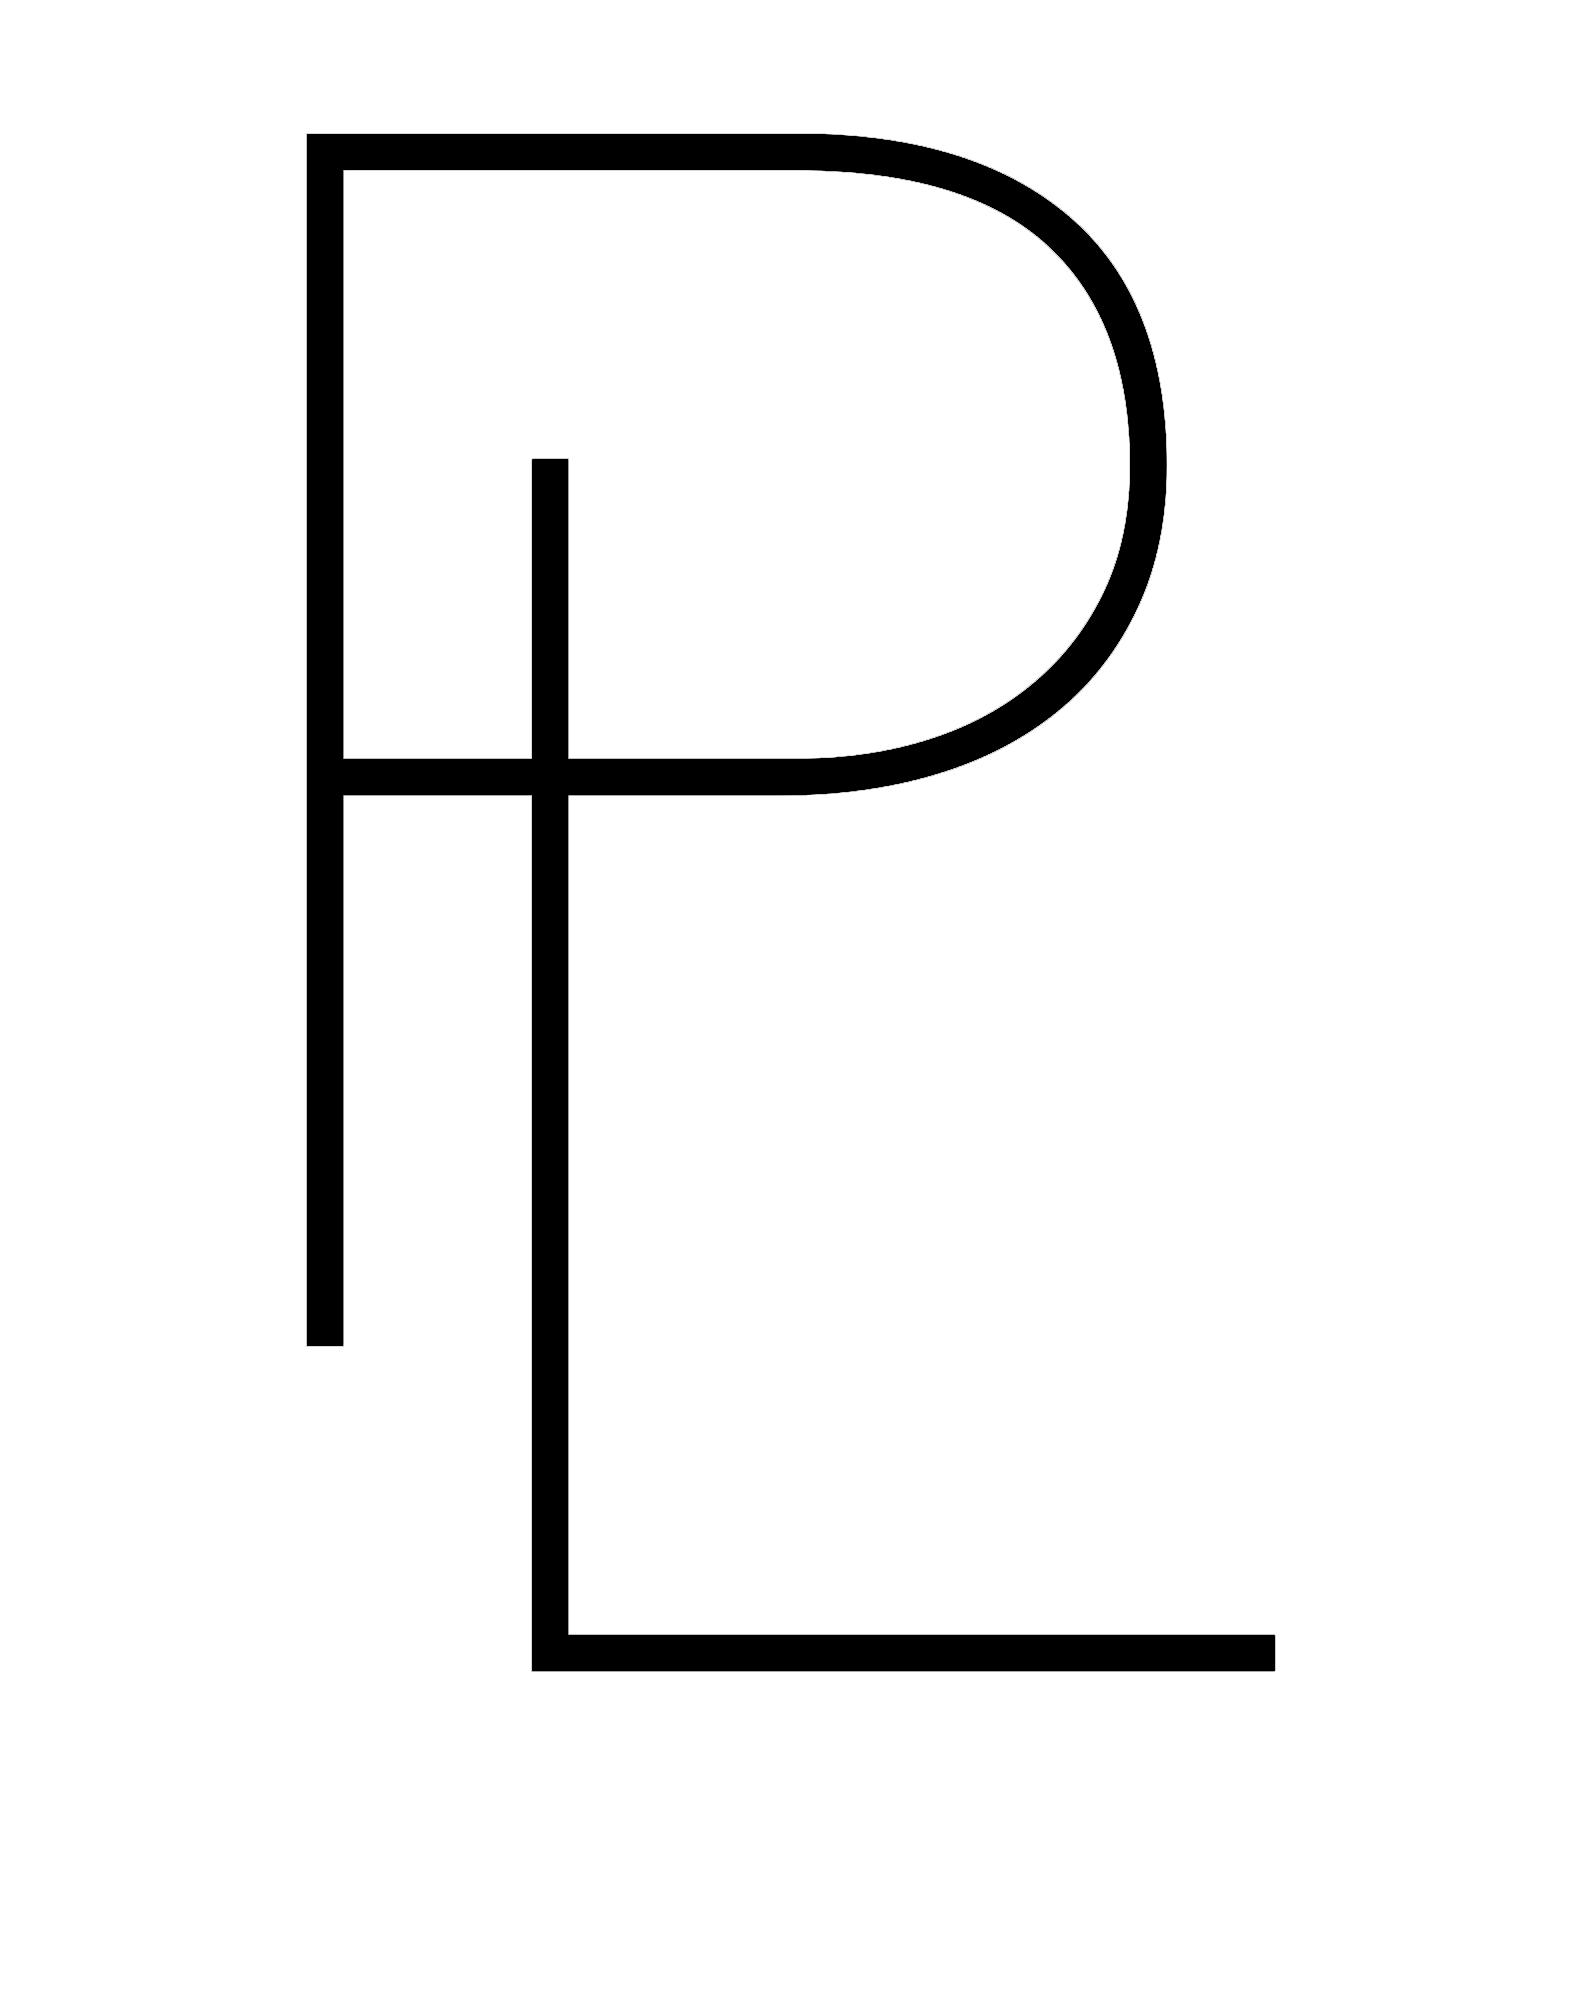 Archivo:Pura Lopez logo.jpg Wikipedia, la enciclopedia libre